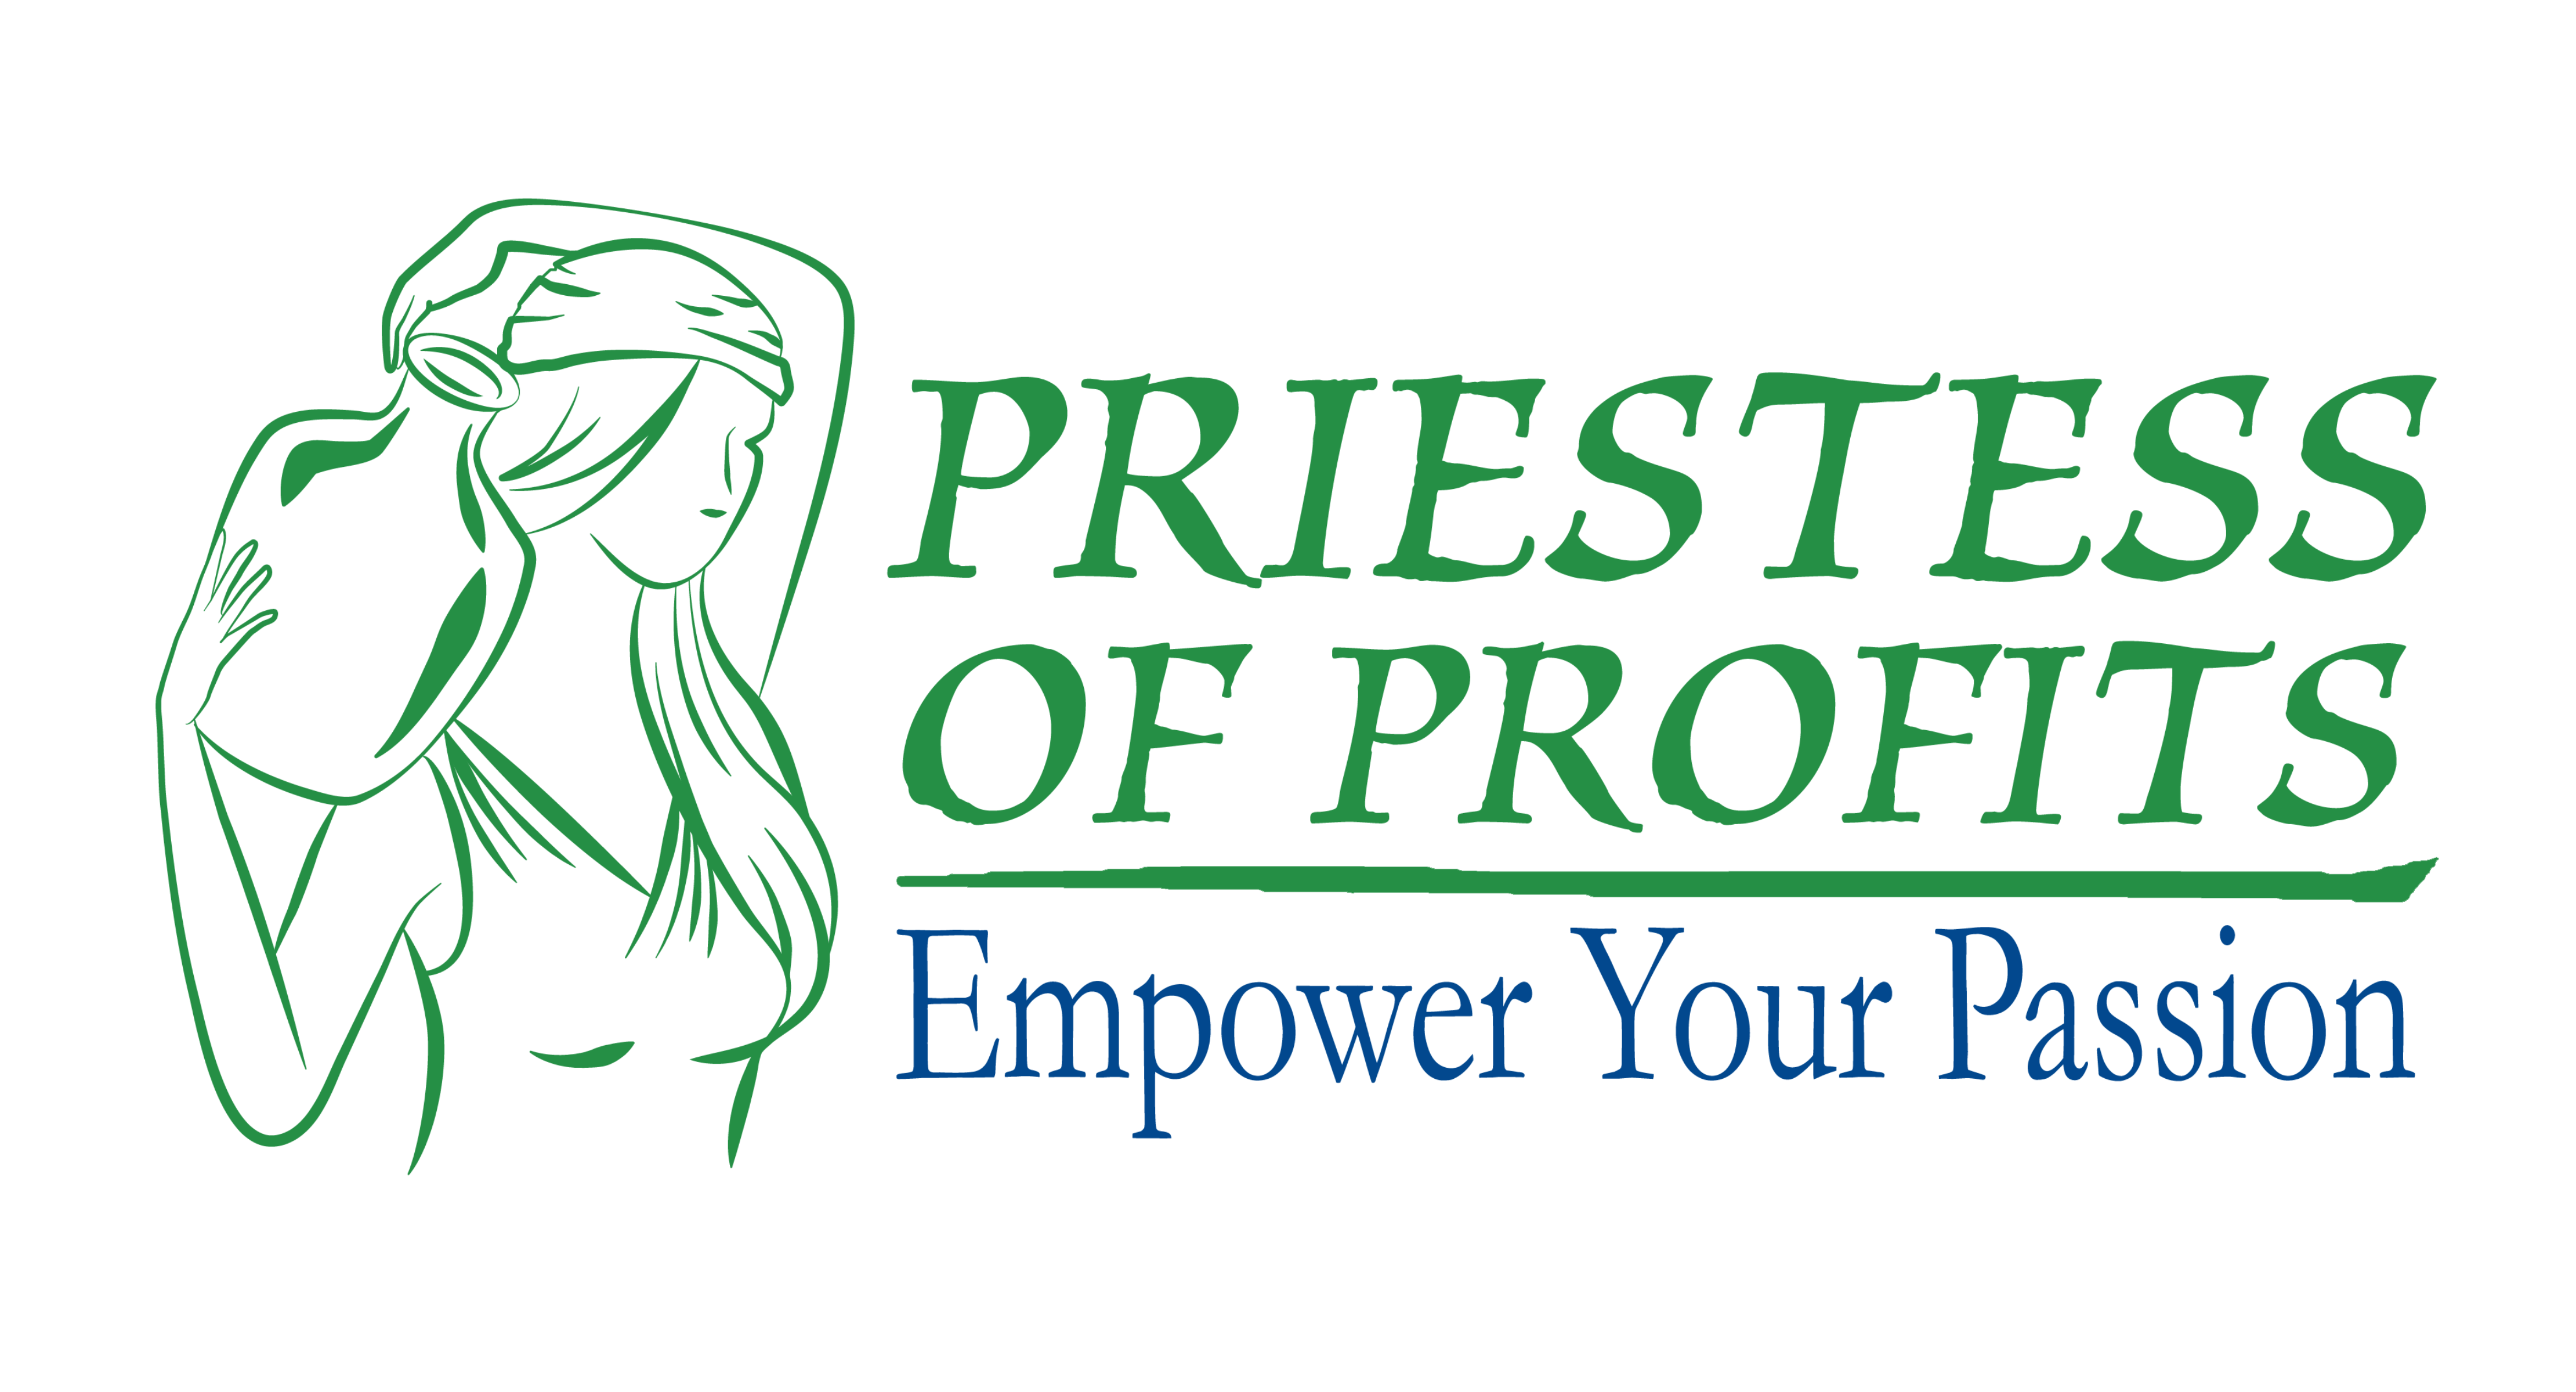 Priestess of Profits Logo